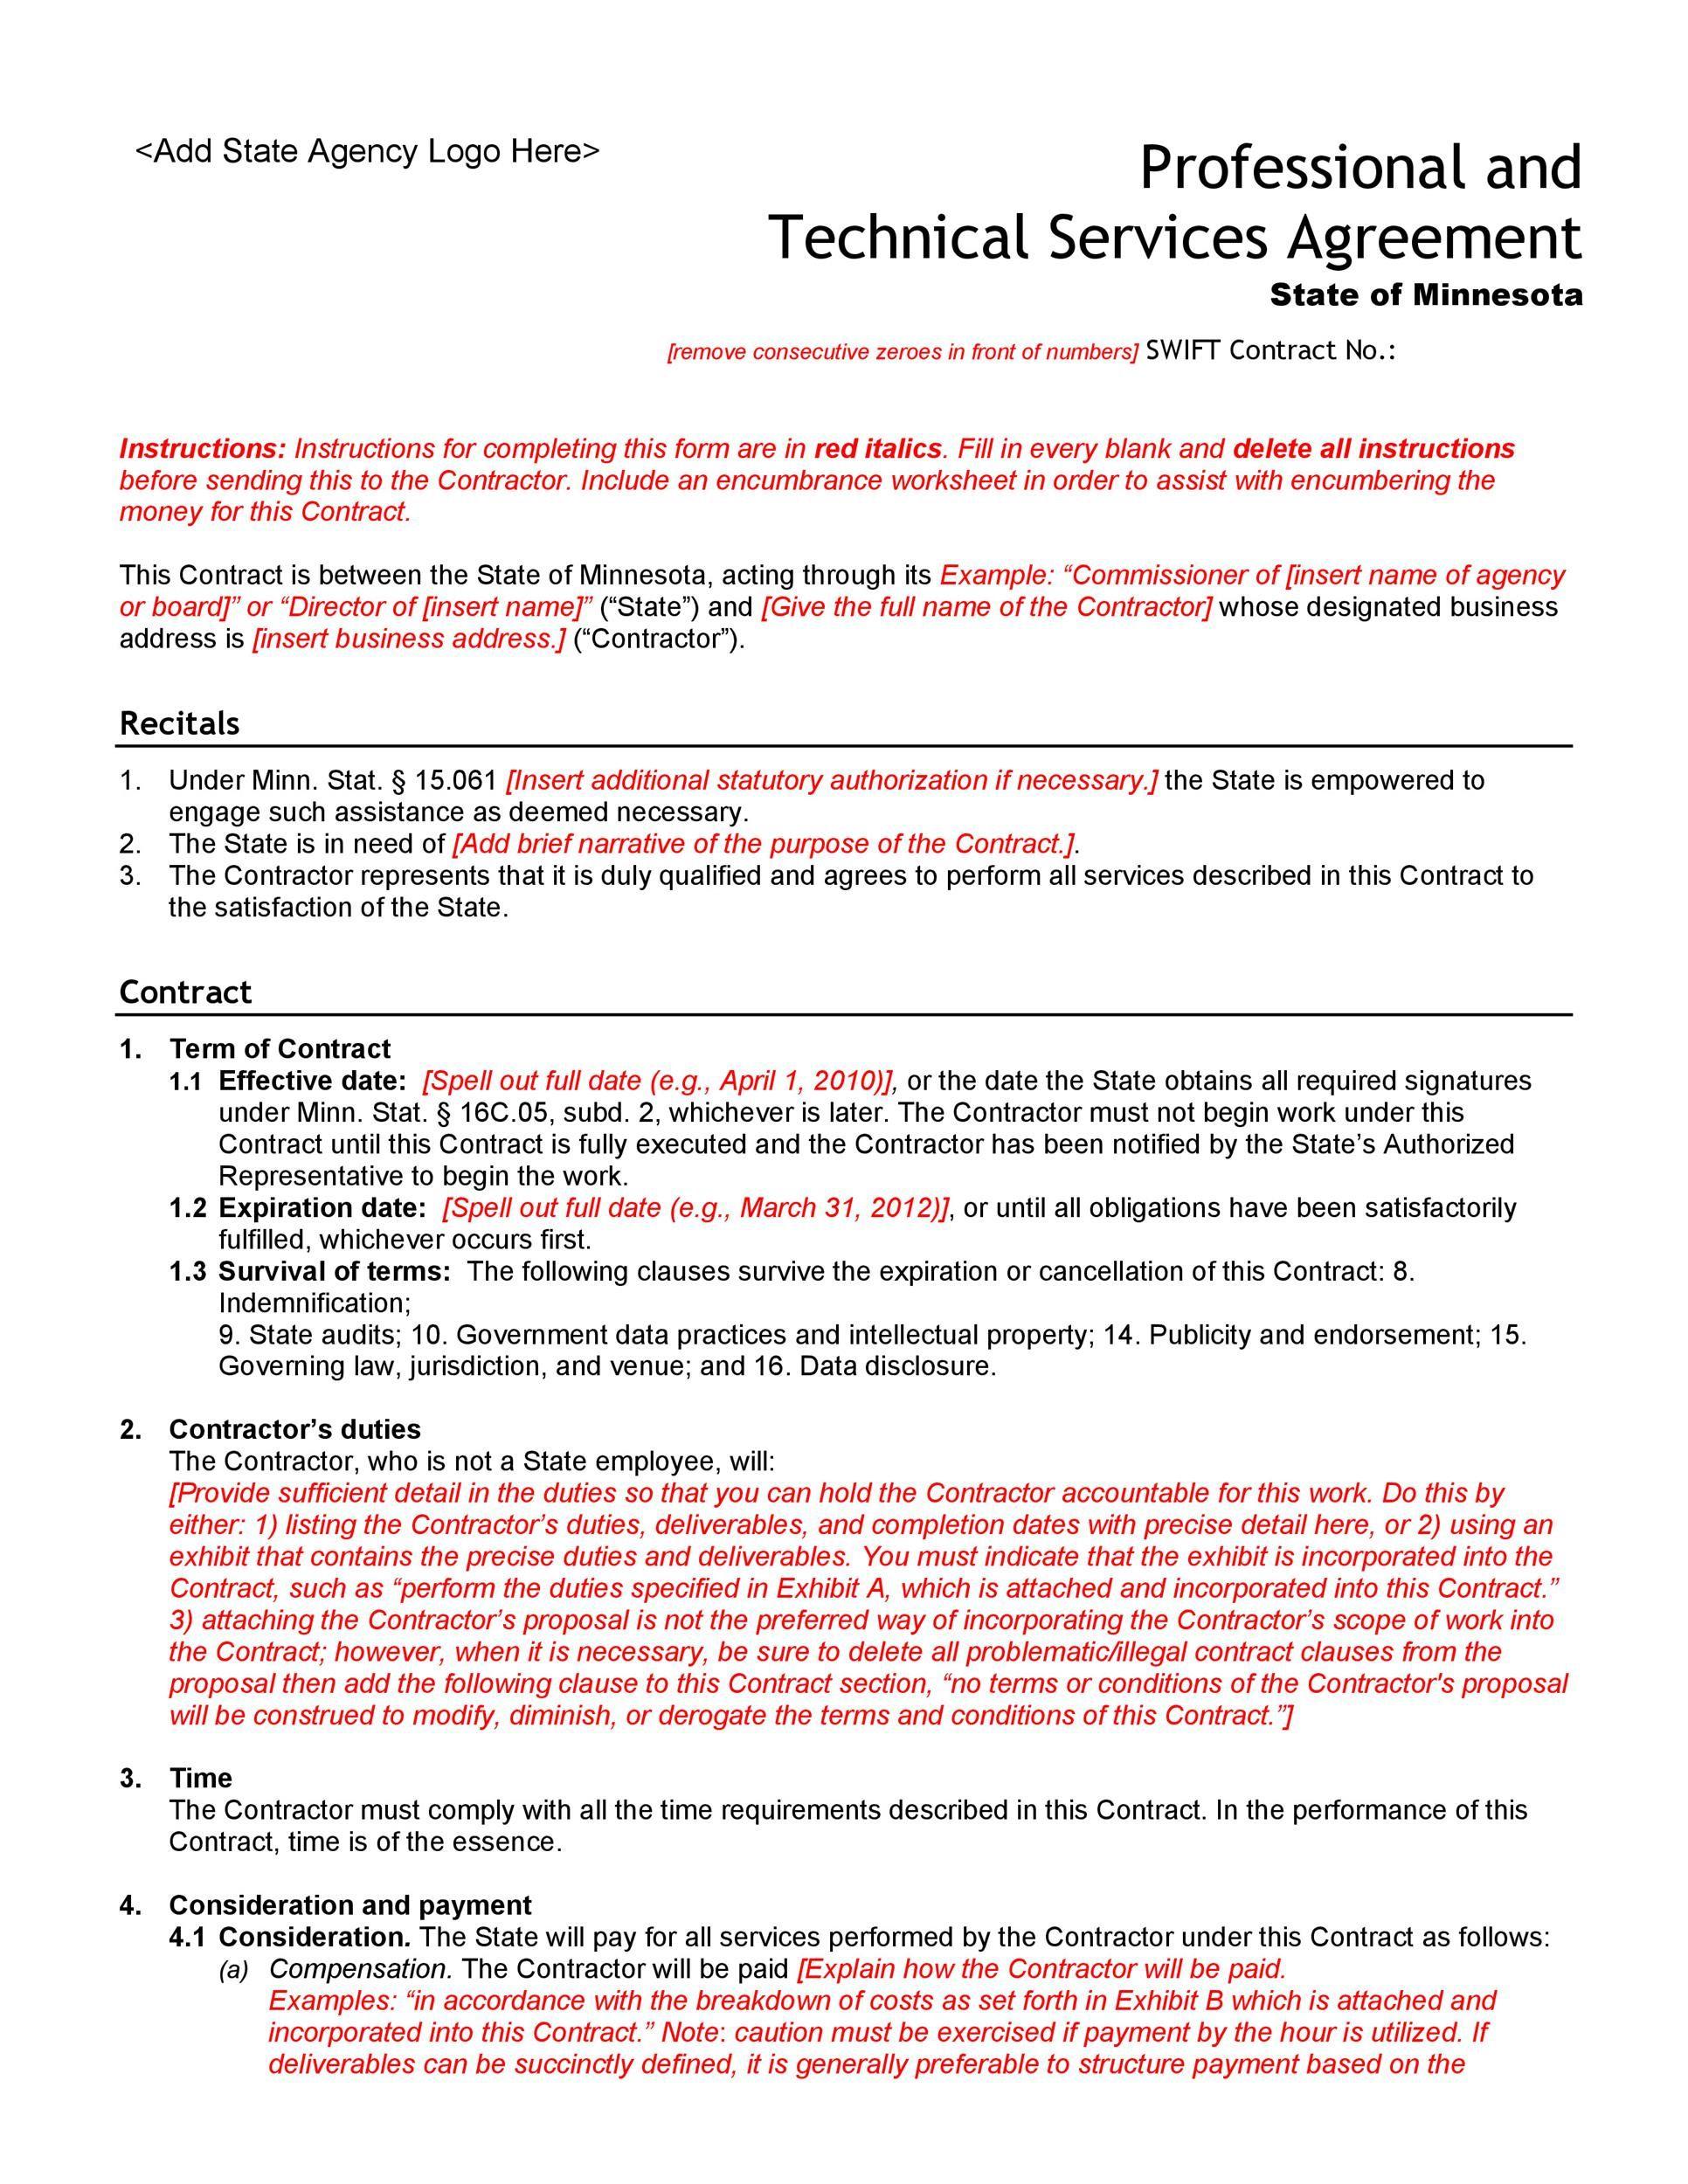 007 Stupendou Master Service Agreement Template Inspiration  Marketing For Software DevelopmentFull